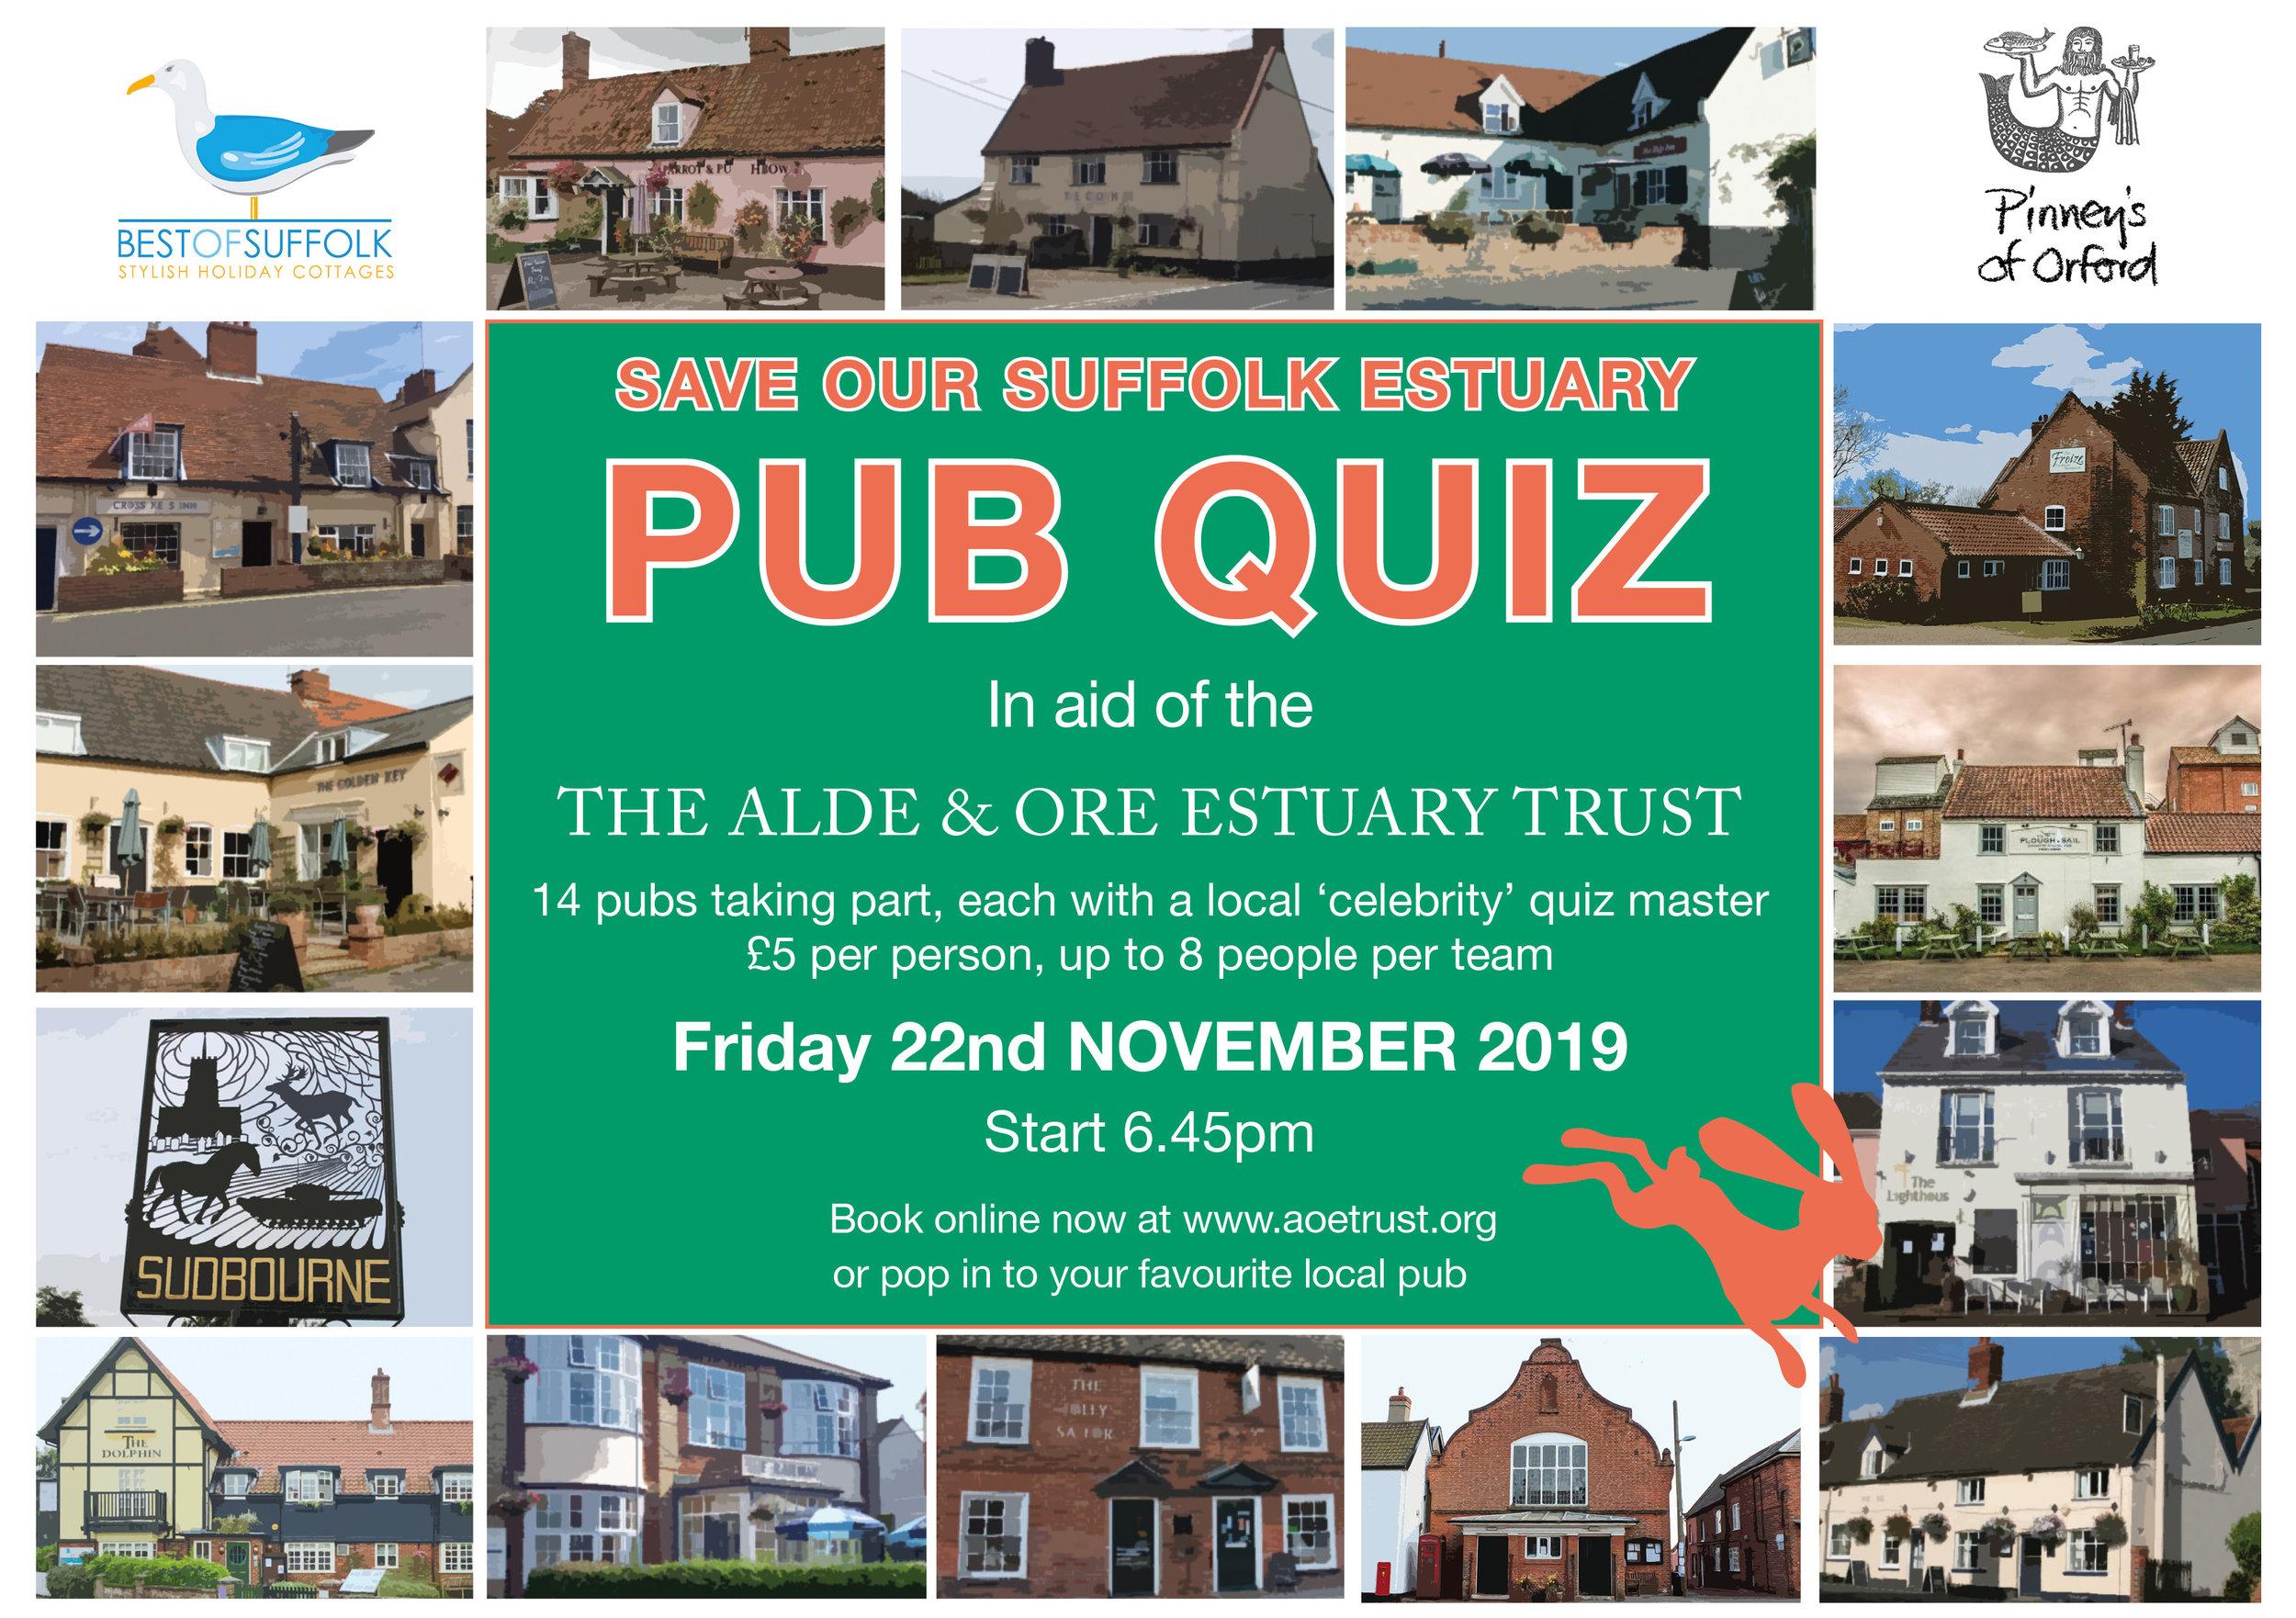 pub quiz flyer front 2019-FINAL.jpg